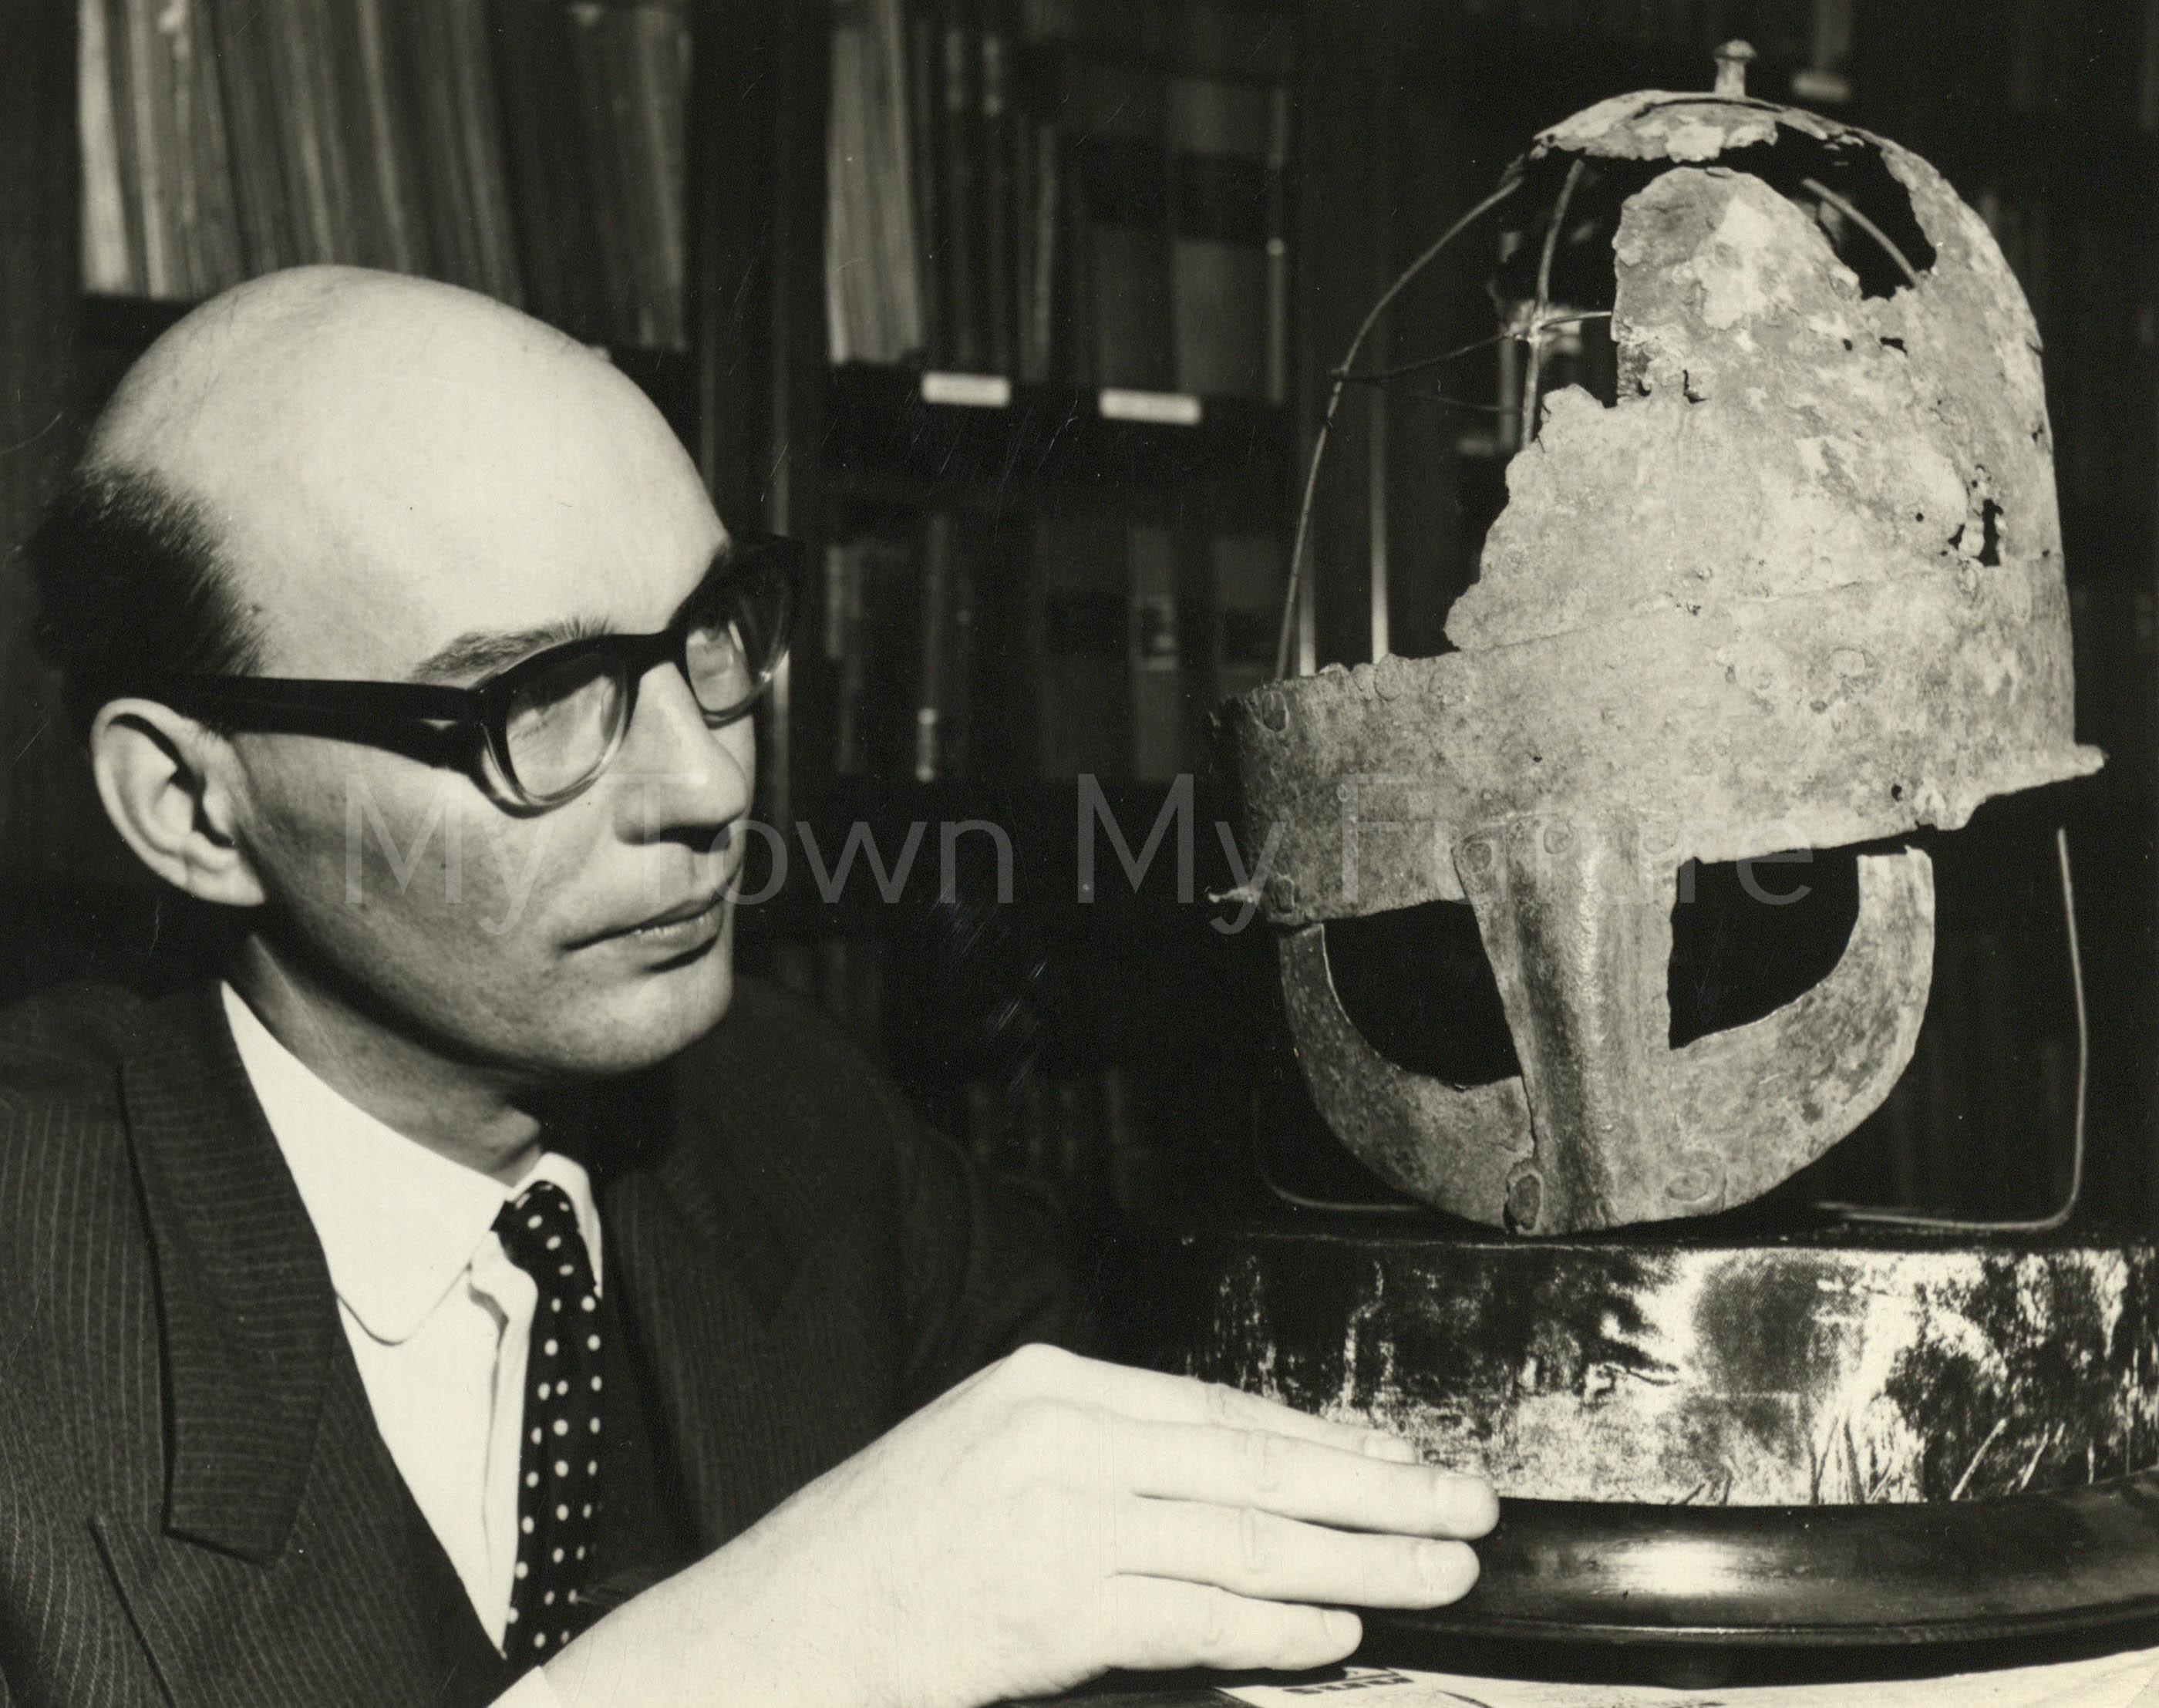 Dorman Museum Curator Mr GG Wilson & Norman Helmet Dated 1150, 1966, Arnold Kidson